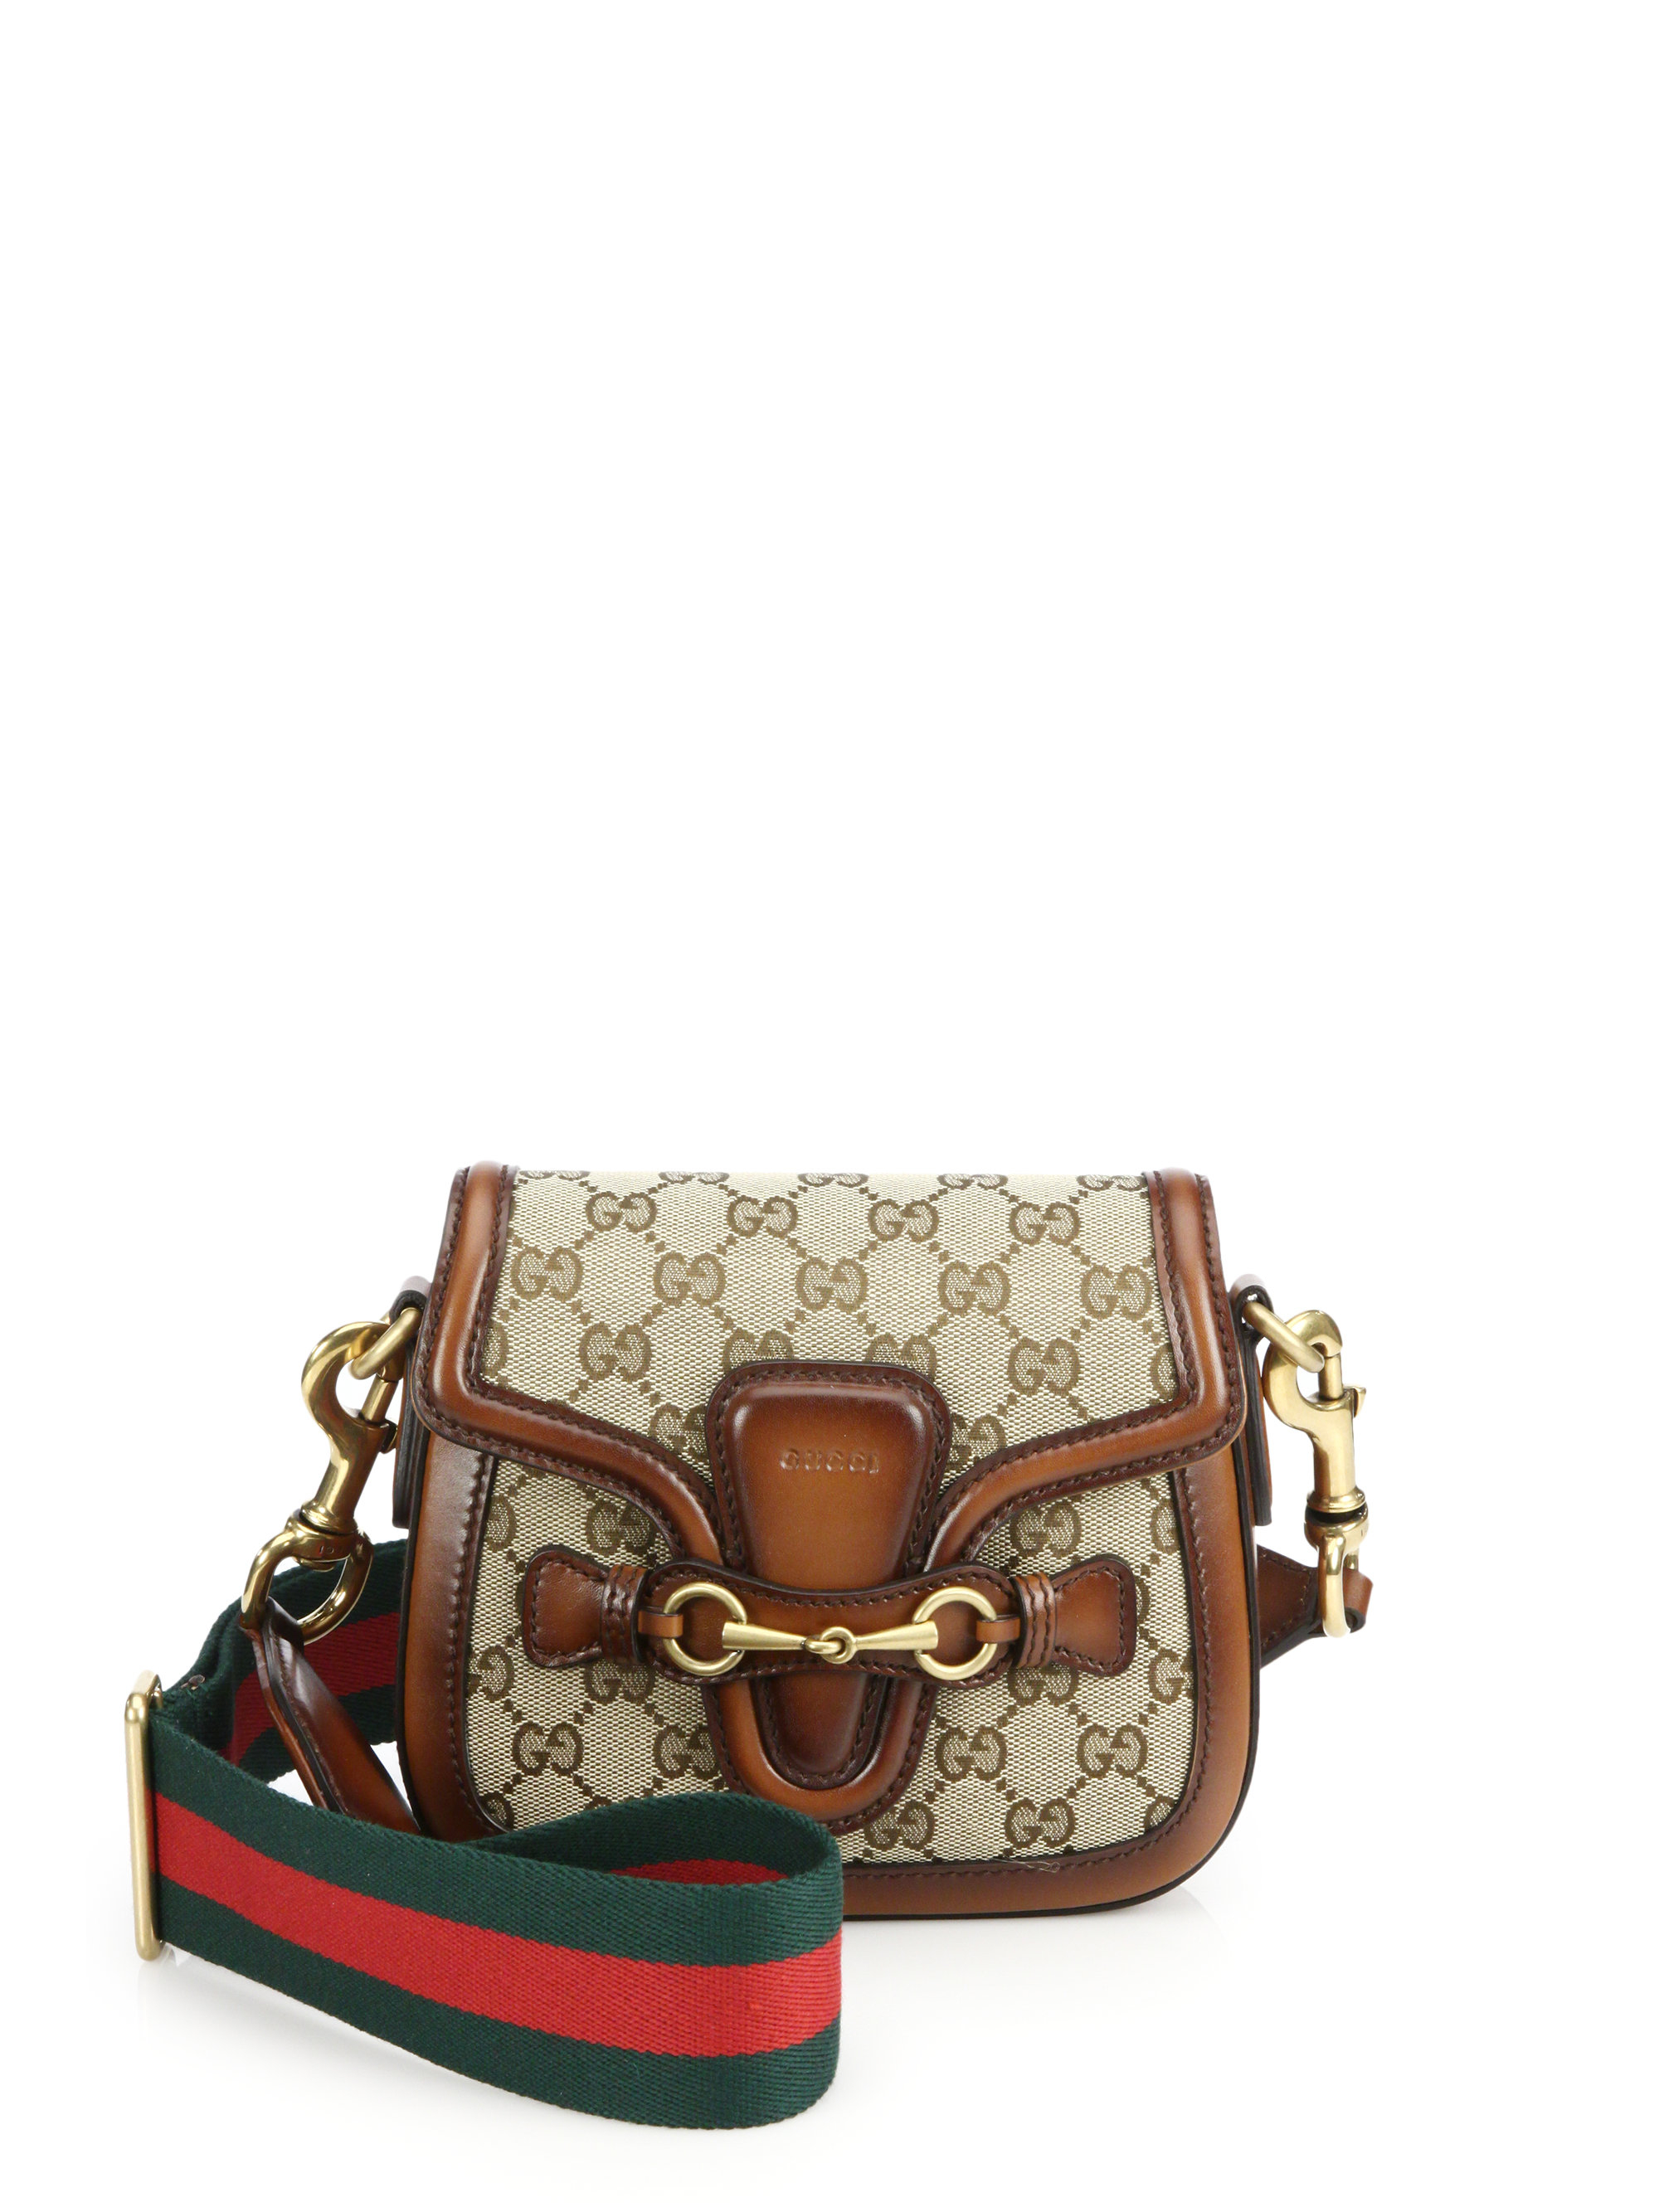 c520122233b7 Lyst - Gucci Lady Web Original Gg Canvas Shoulder Bag in Natural